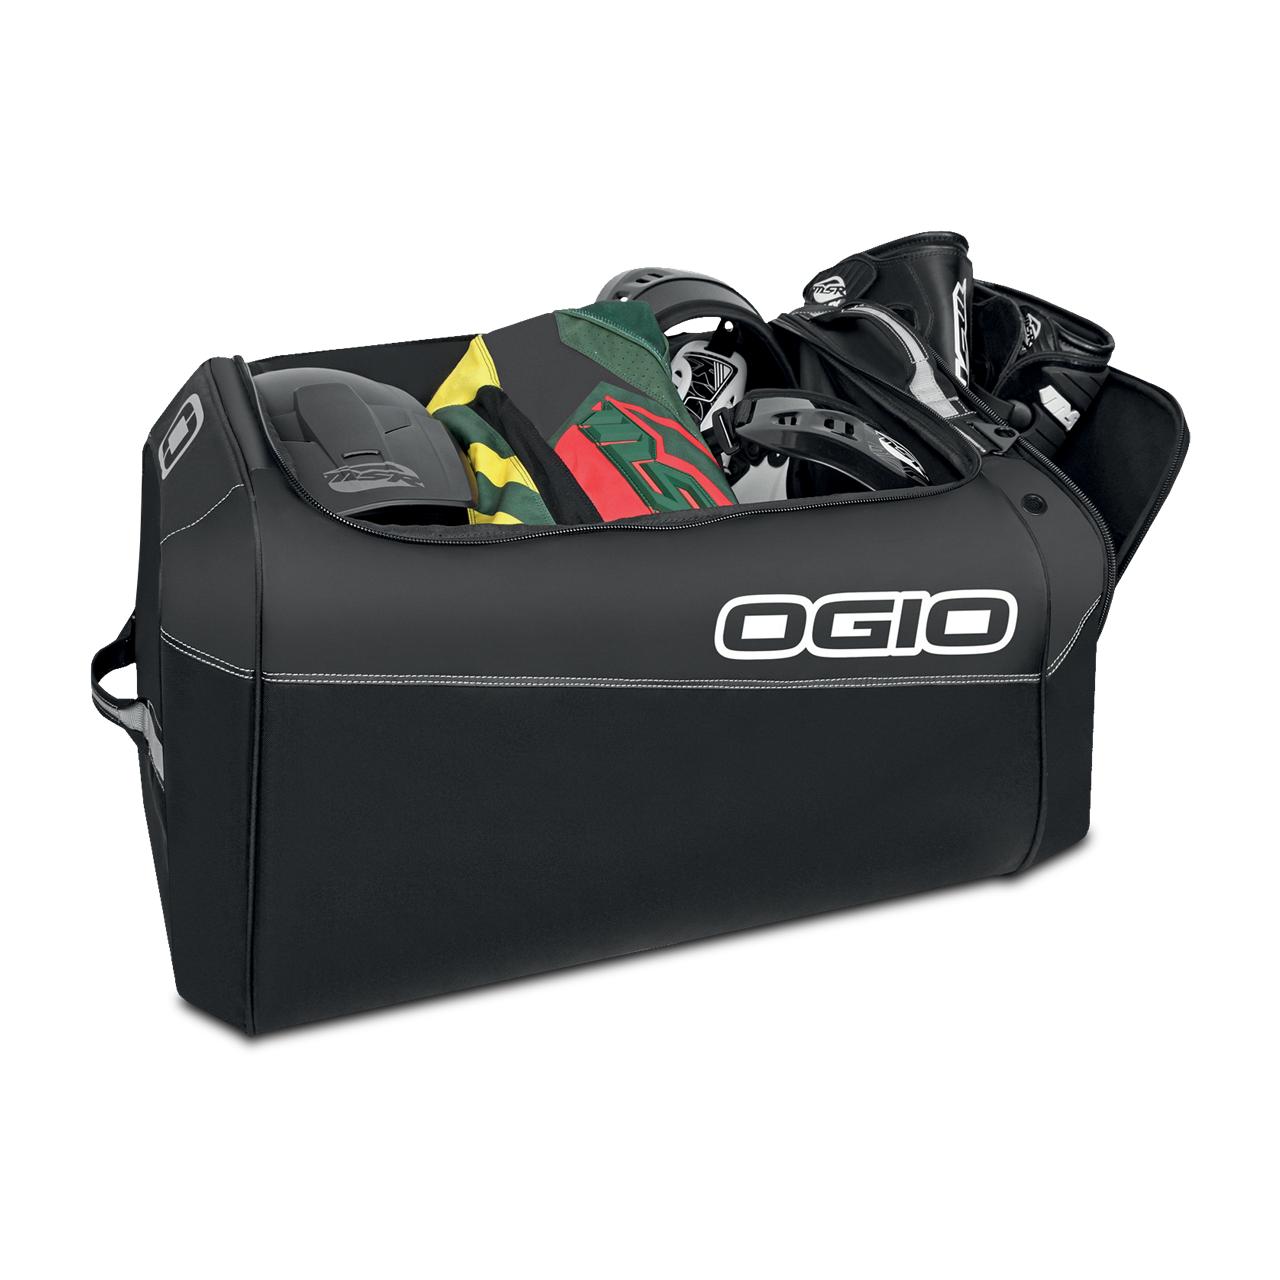 OGIO Sac de Voyage OGIO Sport Prospect Stealth